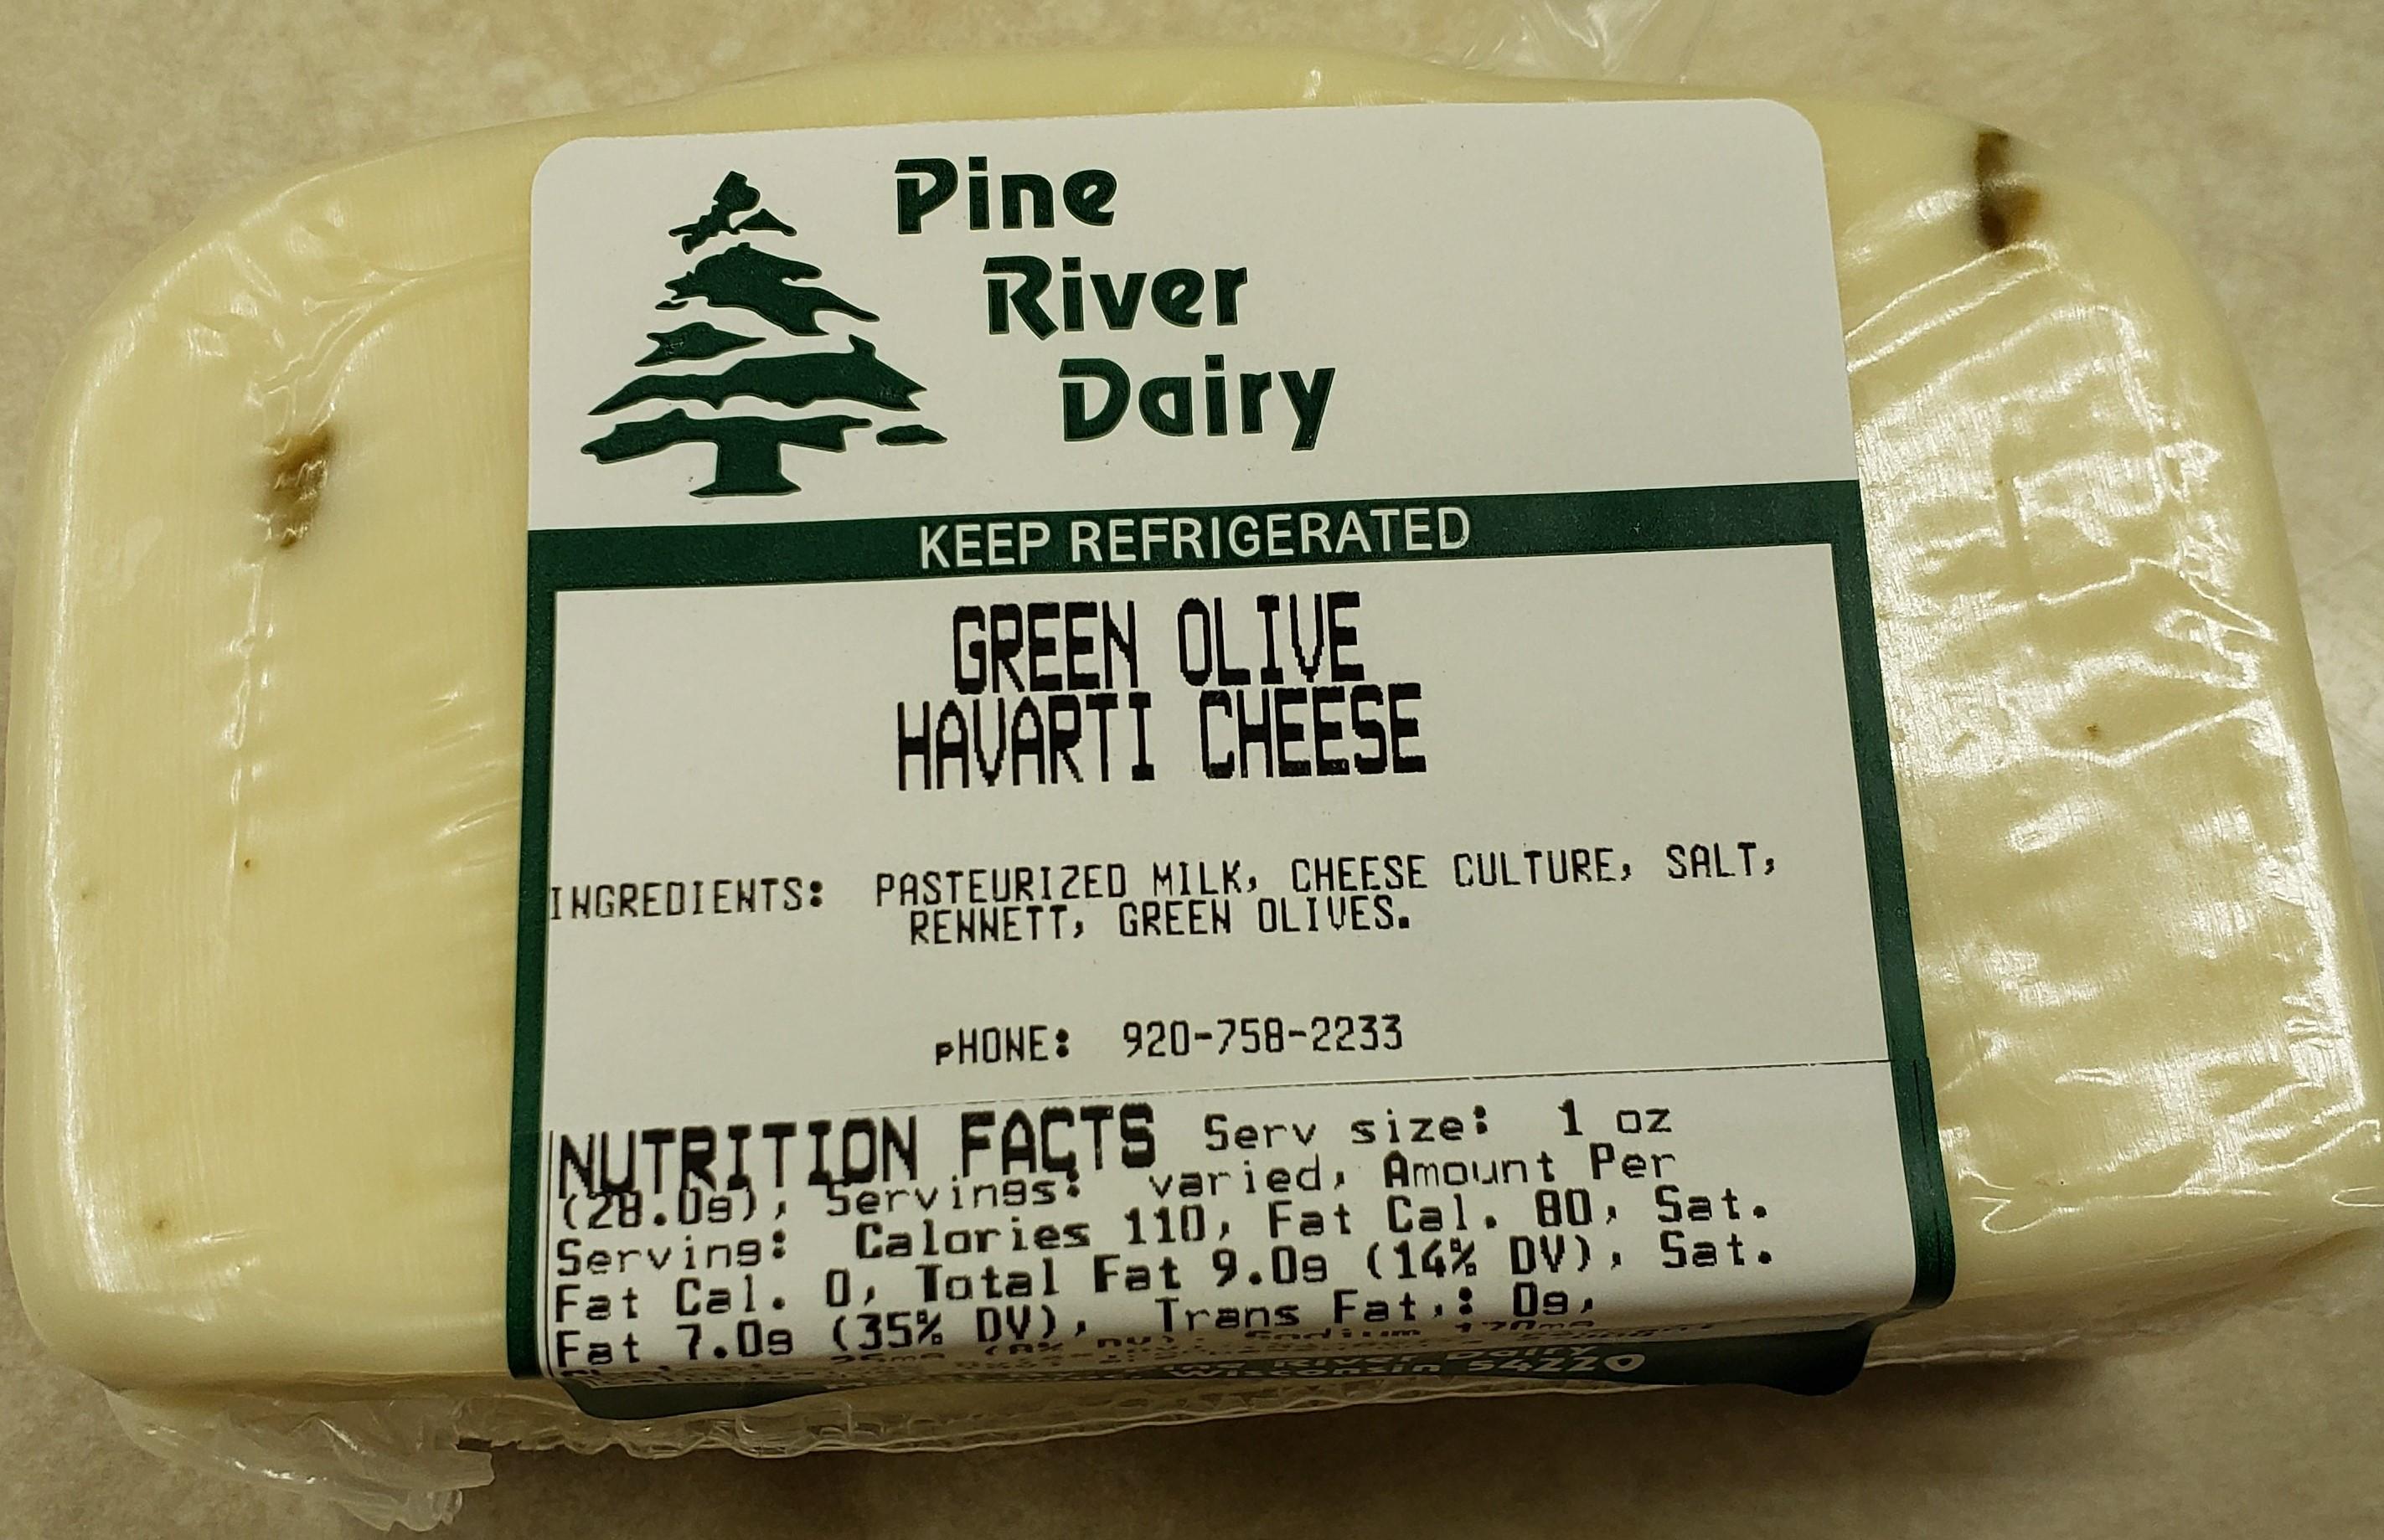 Green Olive Havarti Cheese